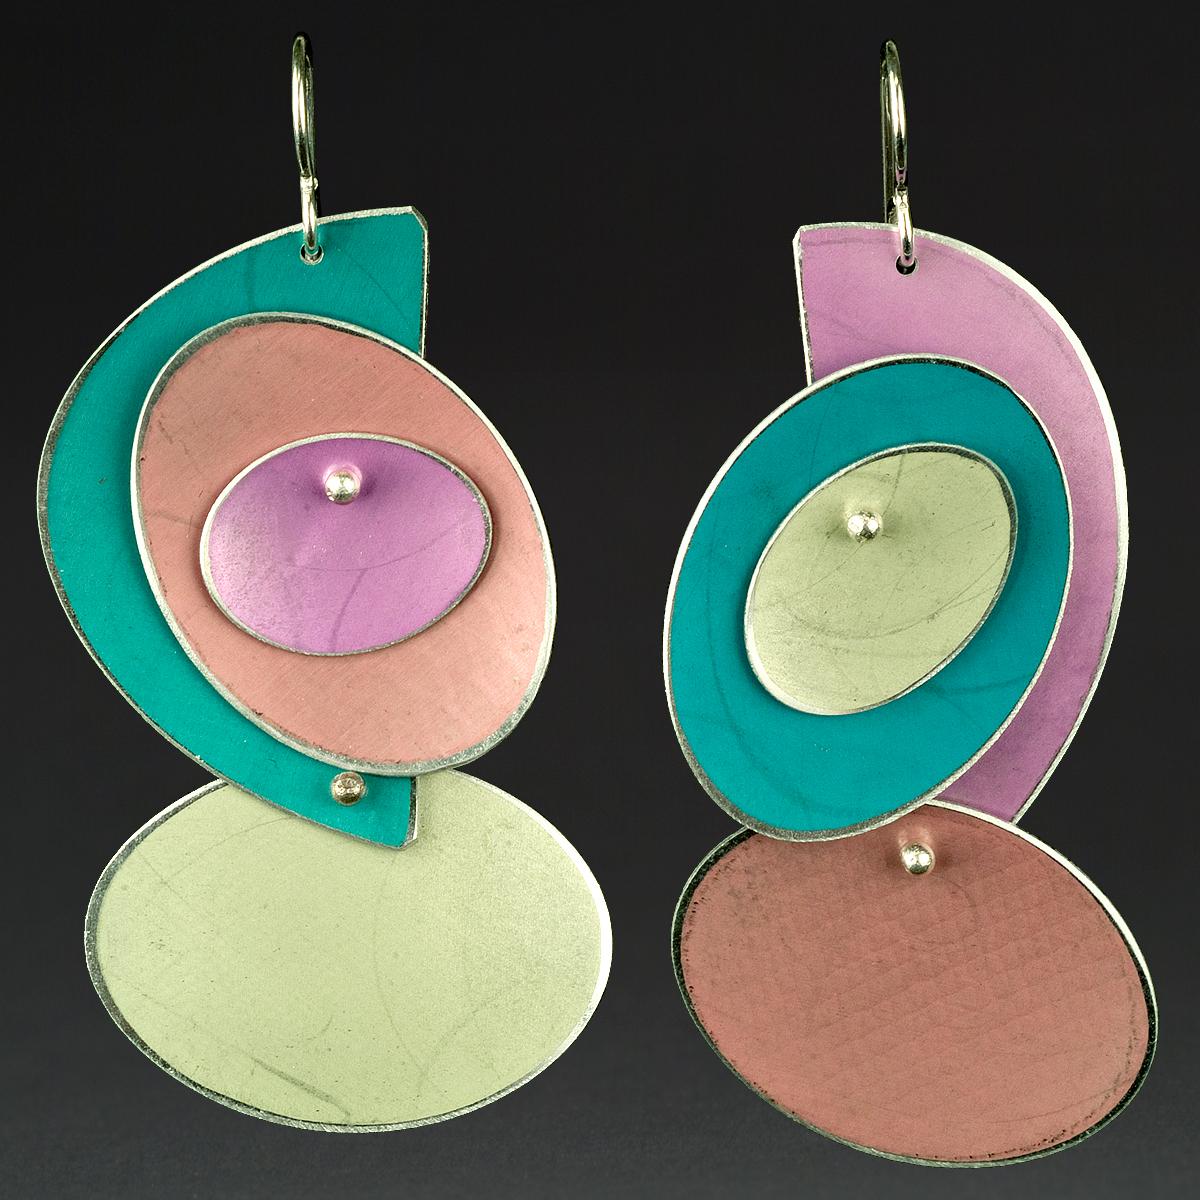 A - Turquoise, Orange, Chablis, Pink